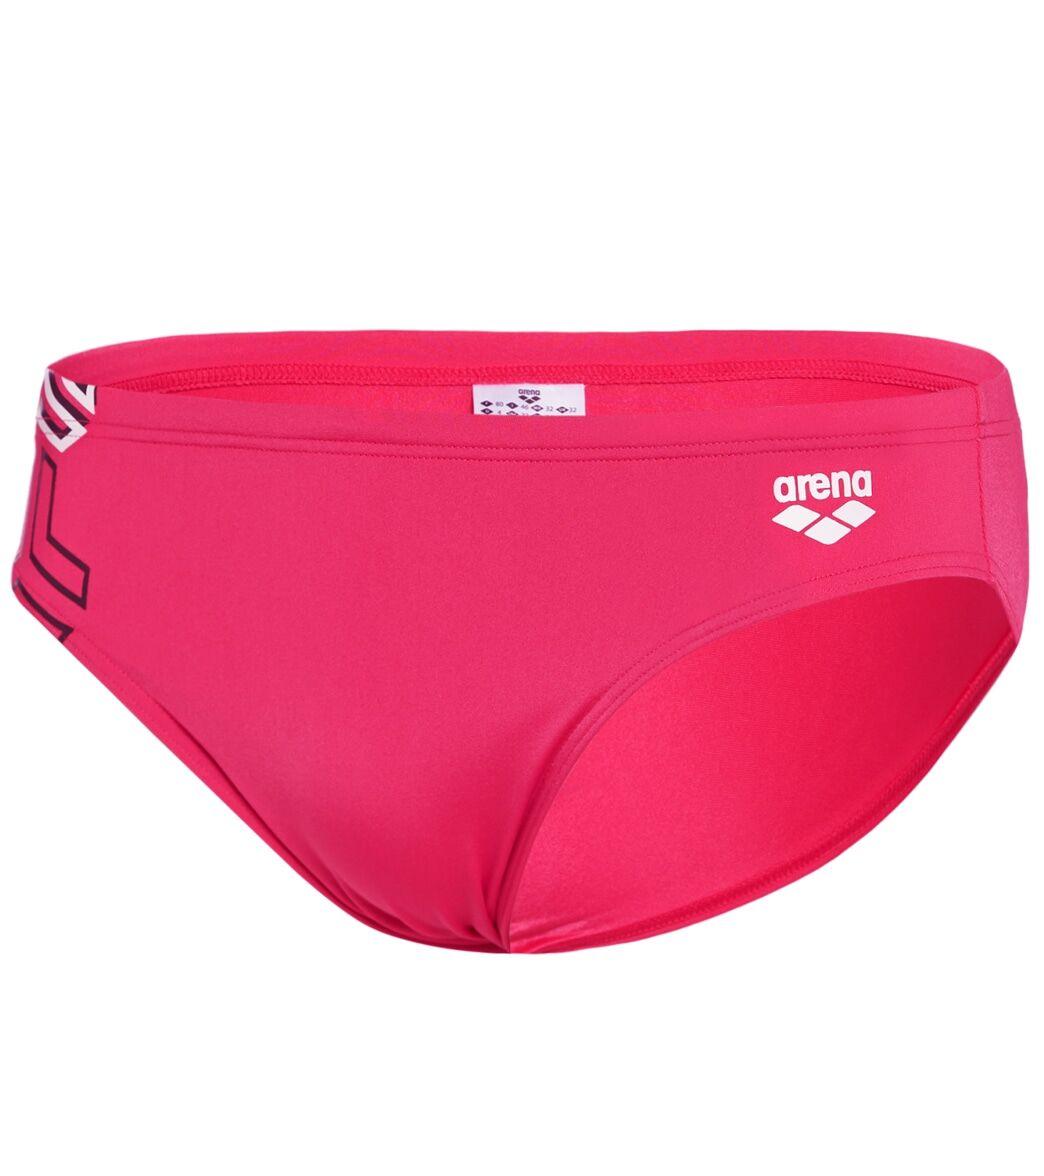 Arena Men's Pink Kikko Brief Swimsuit - Freak Rose 26 - Swimoutlet.com